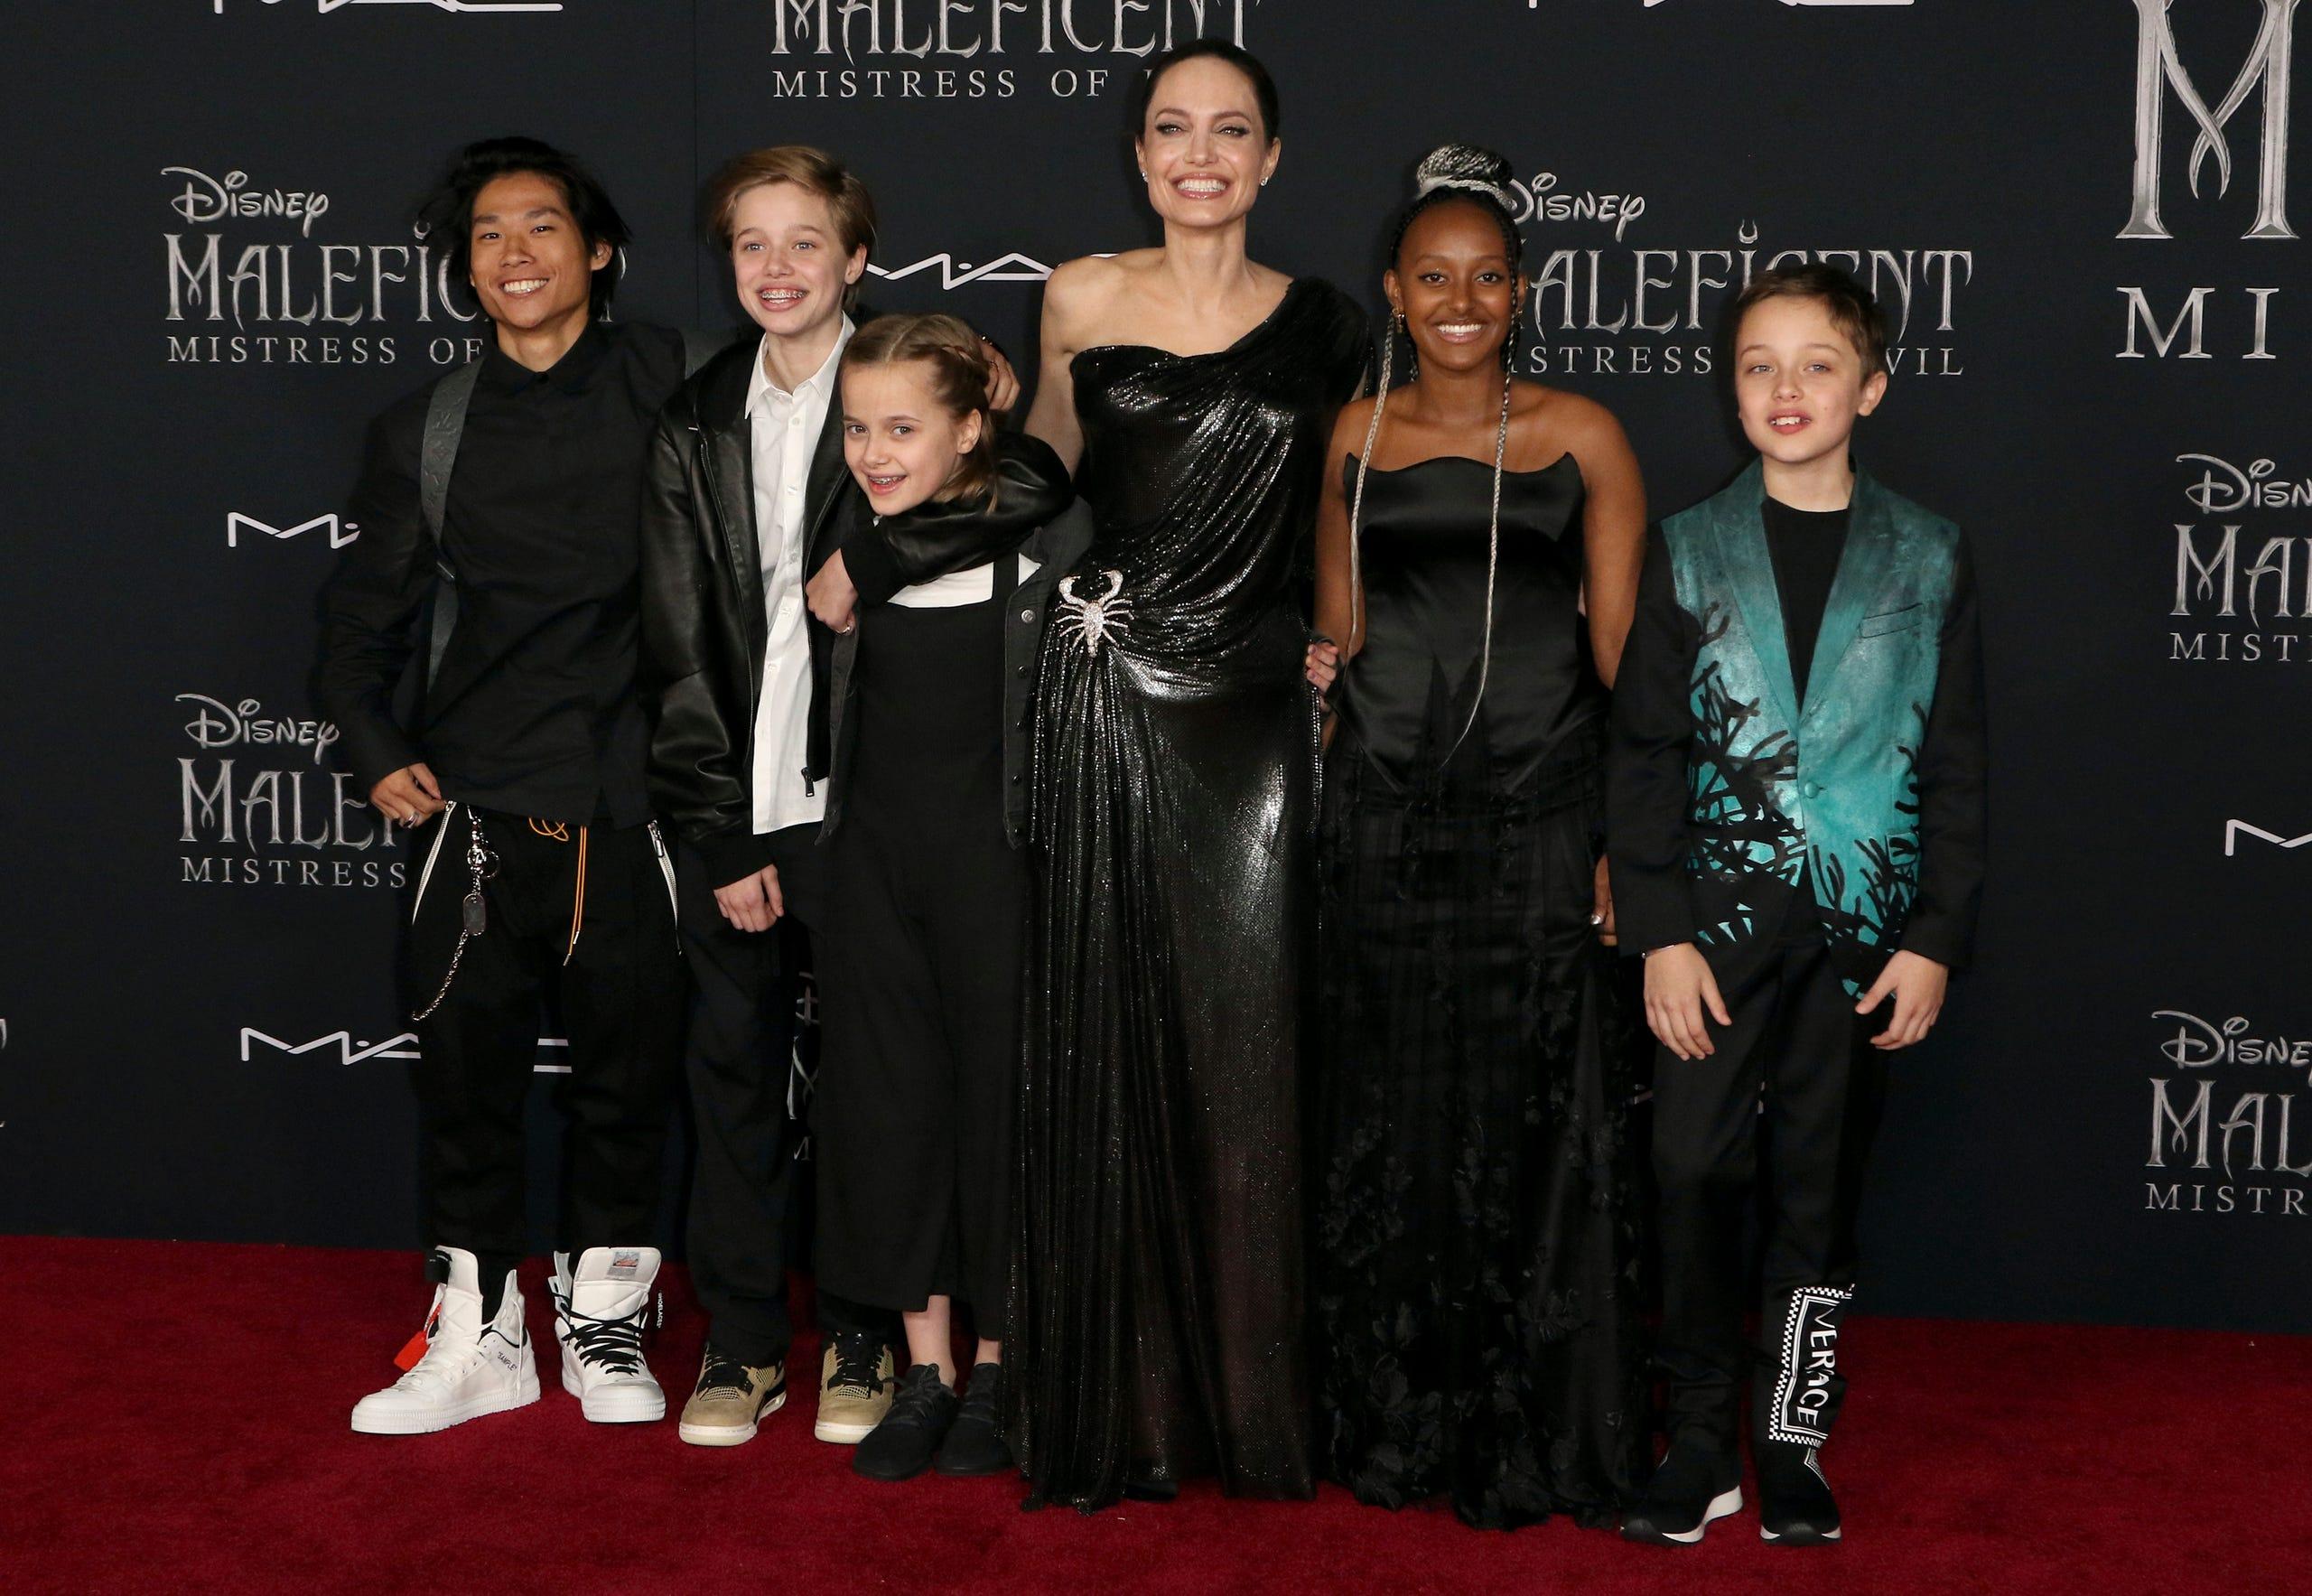 Maleficent Mistress Of Evil Angelina Jolie Elle Fanning